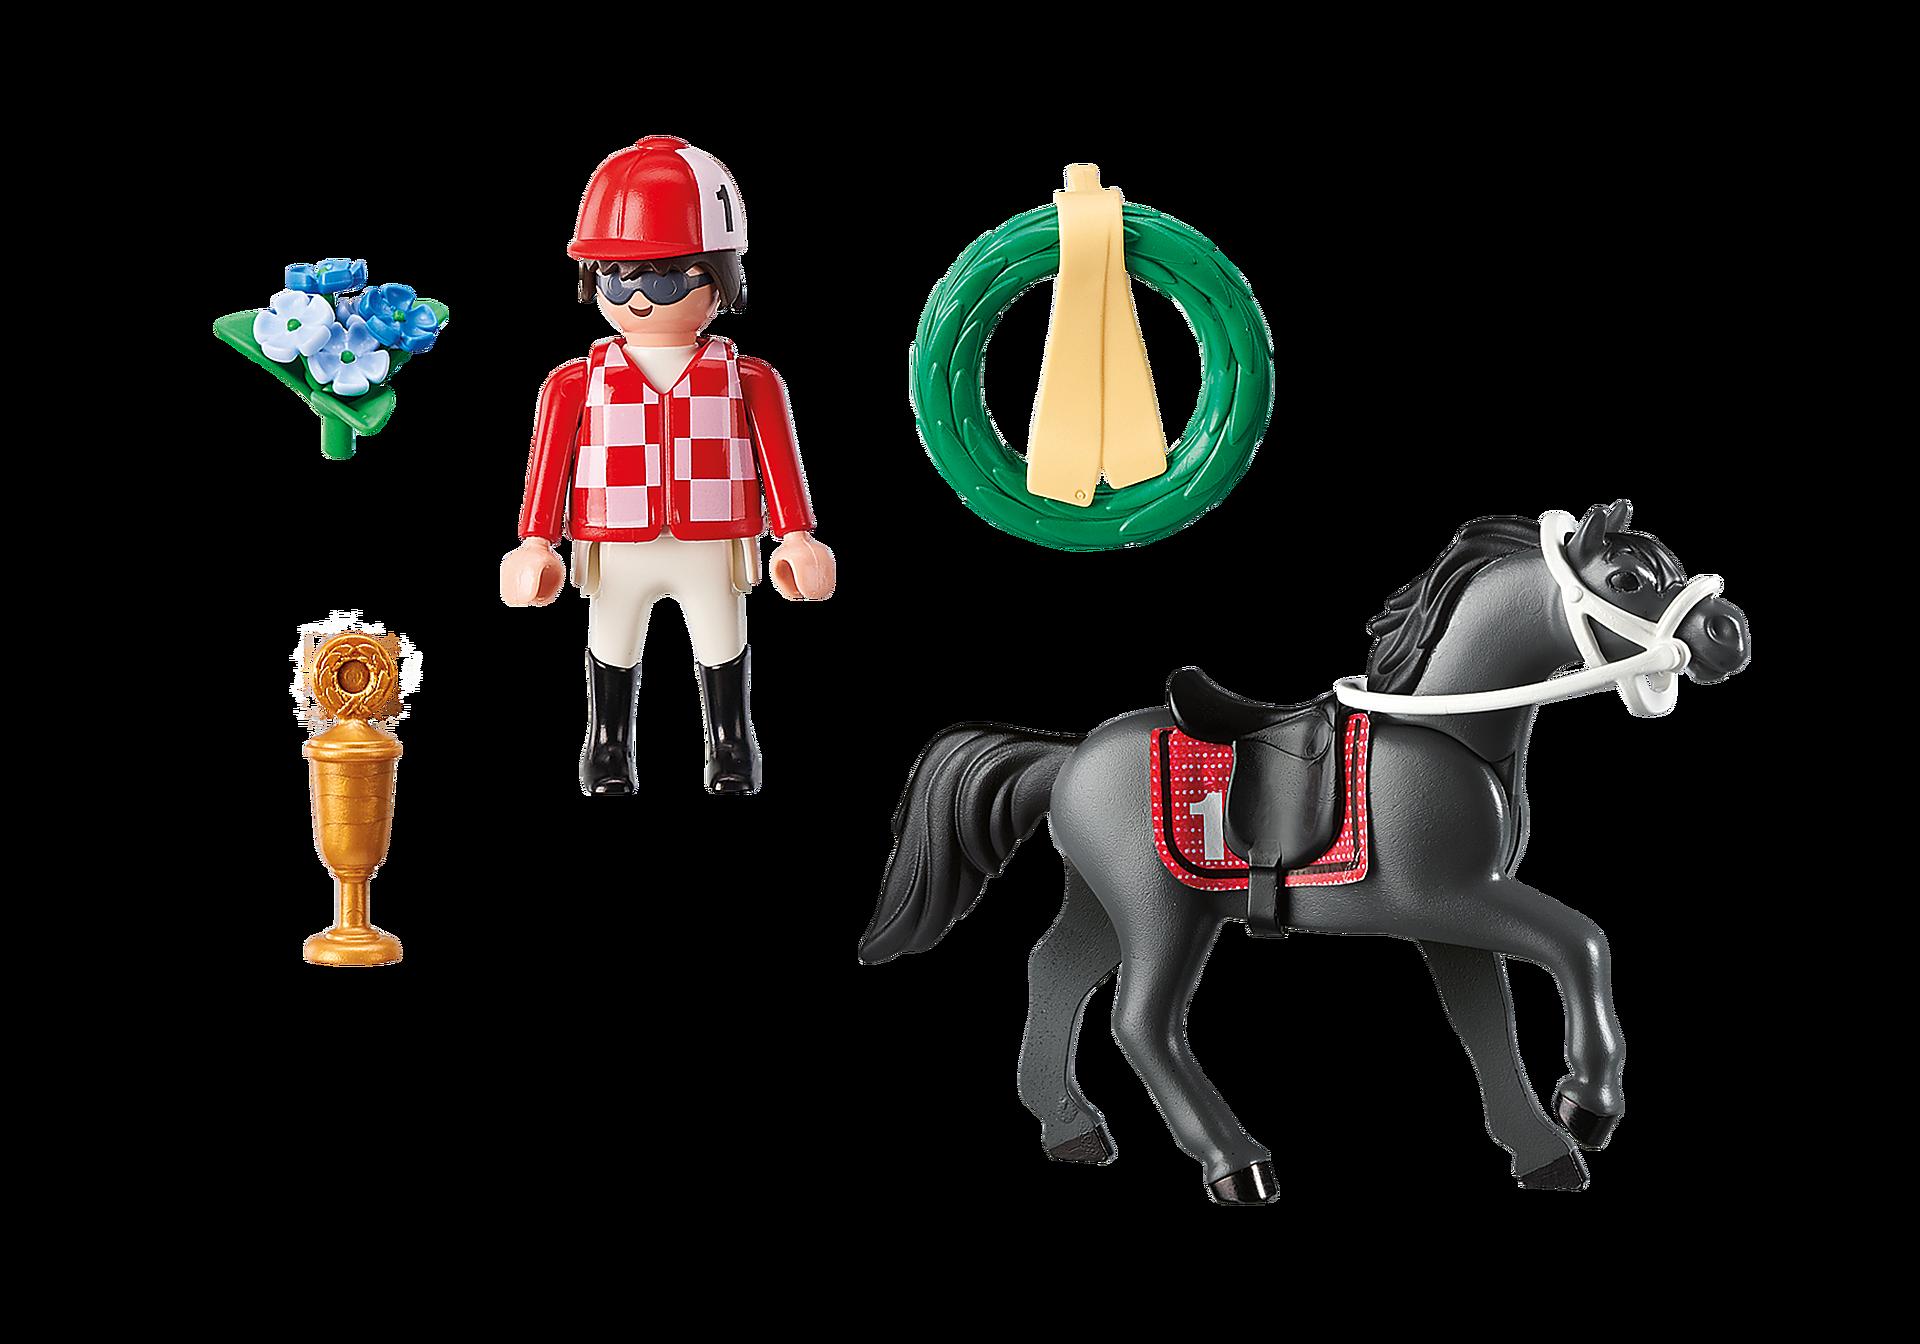 9261 Jockey avec cheval de course zoom image4